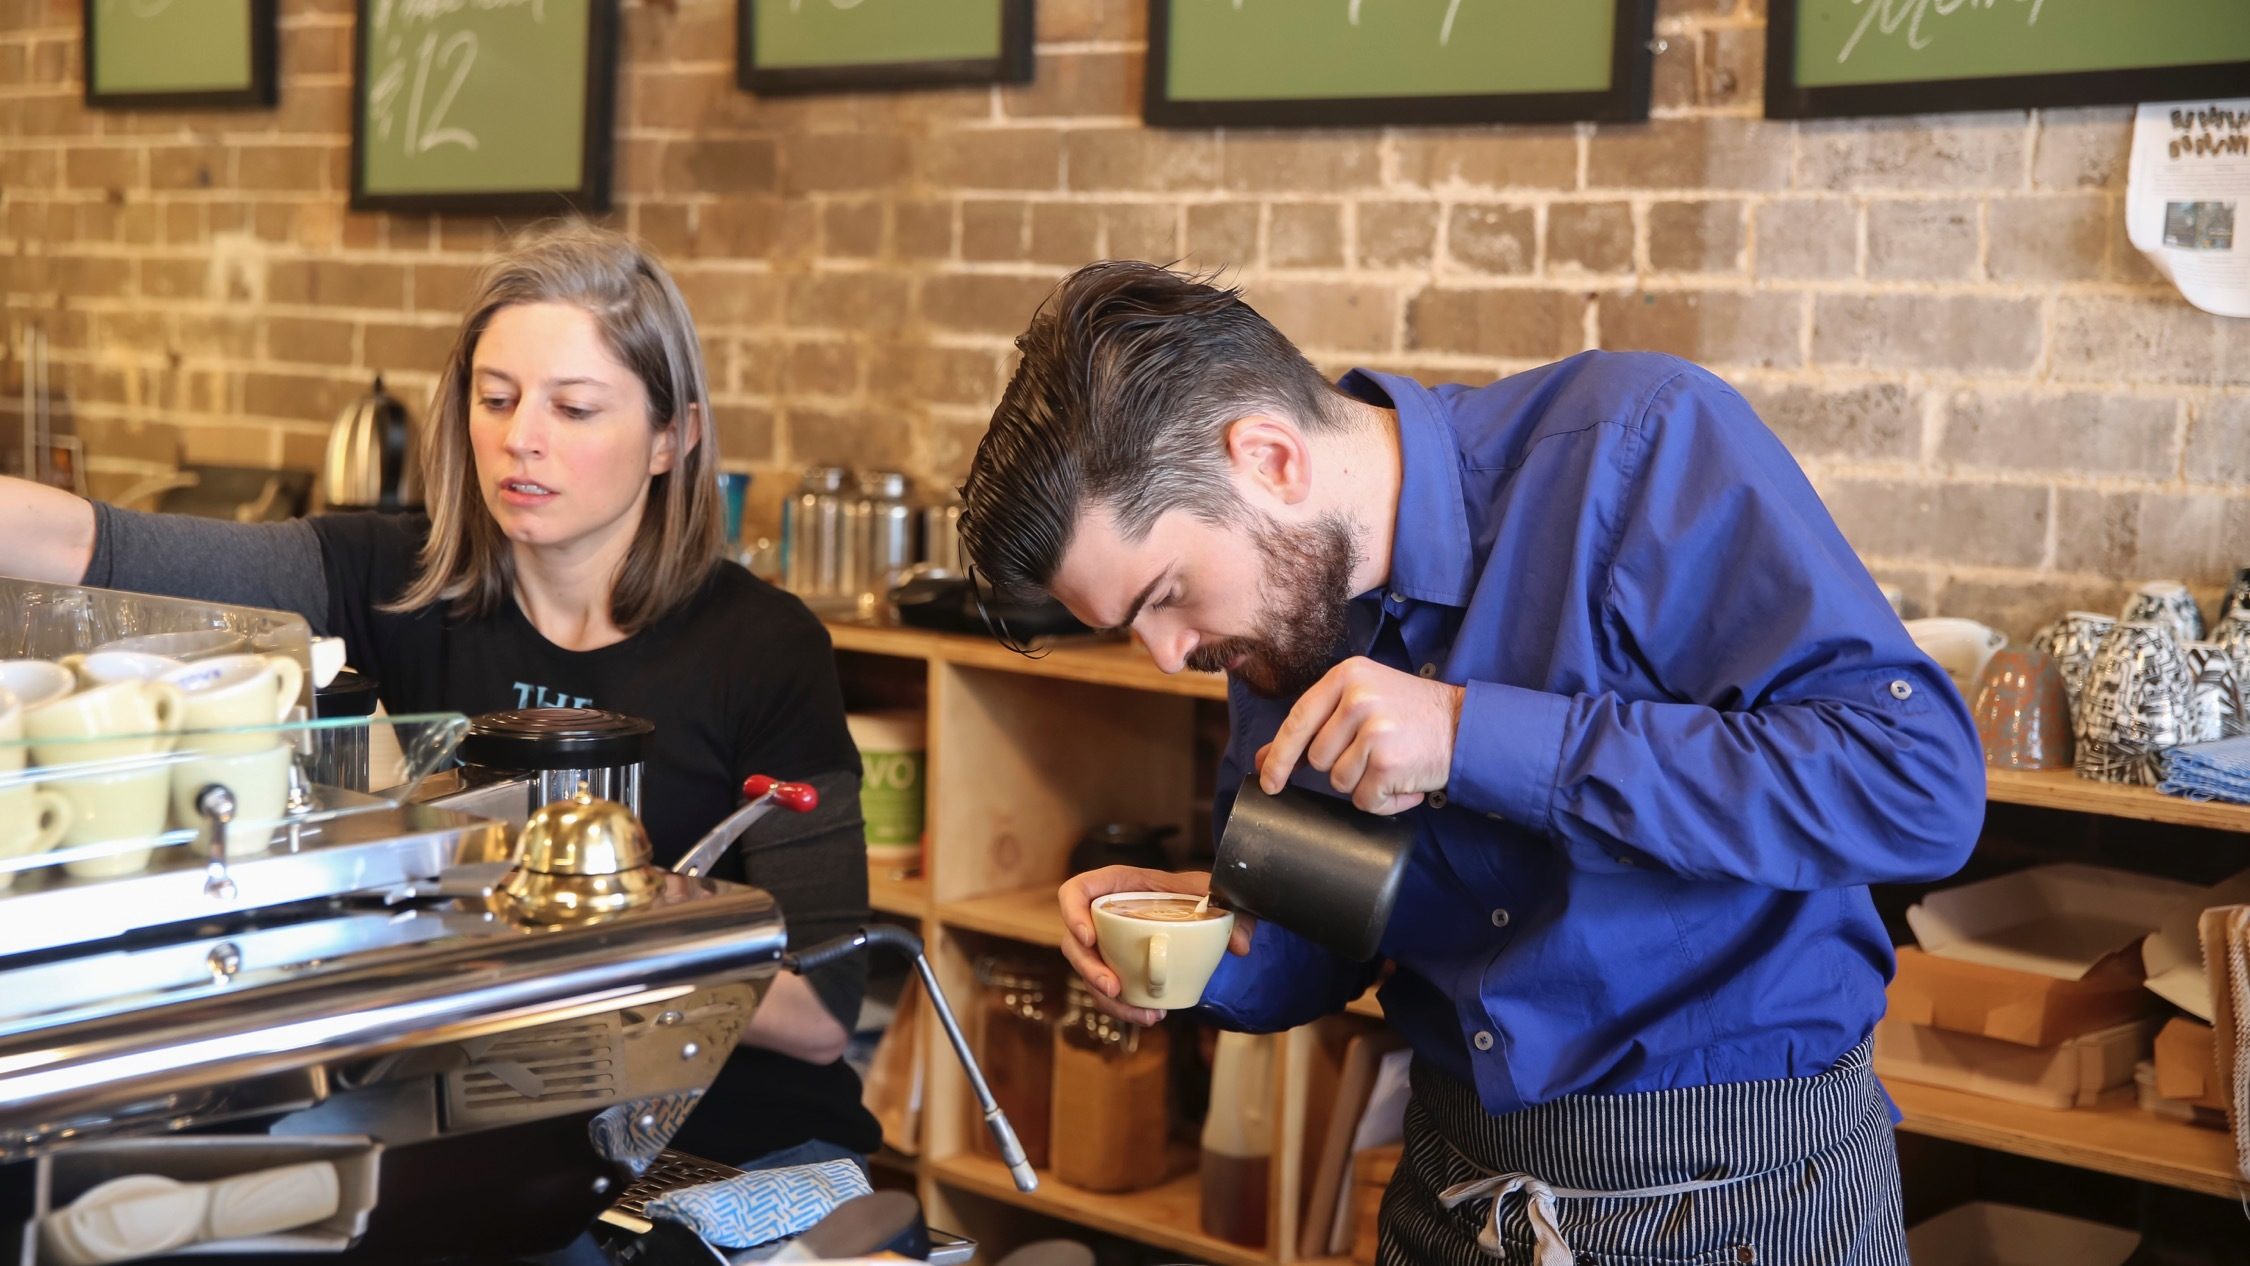 A barista pouring a coffee